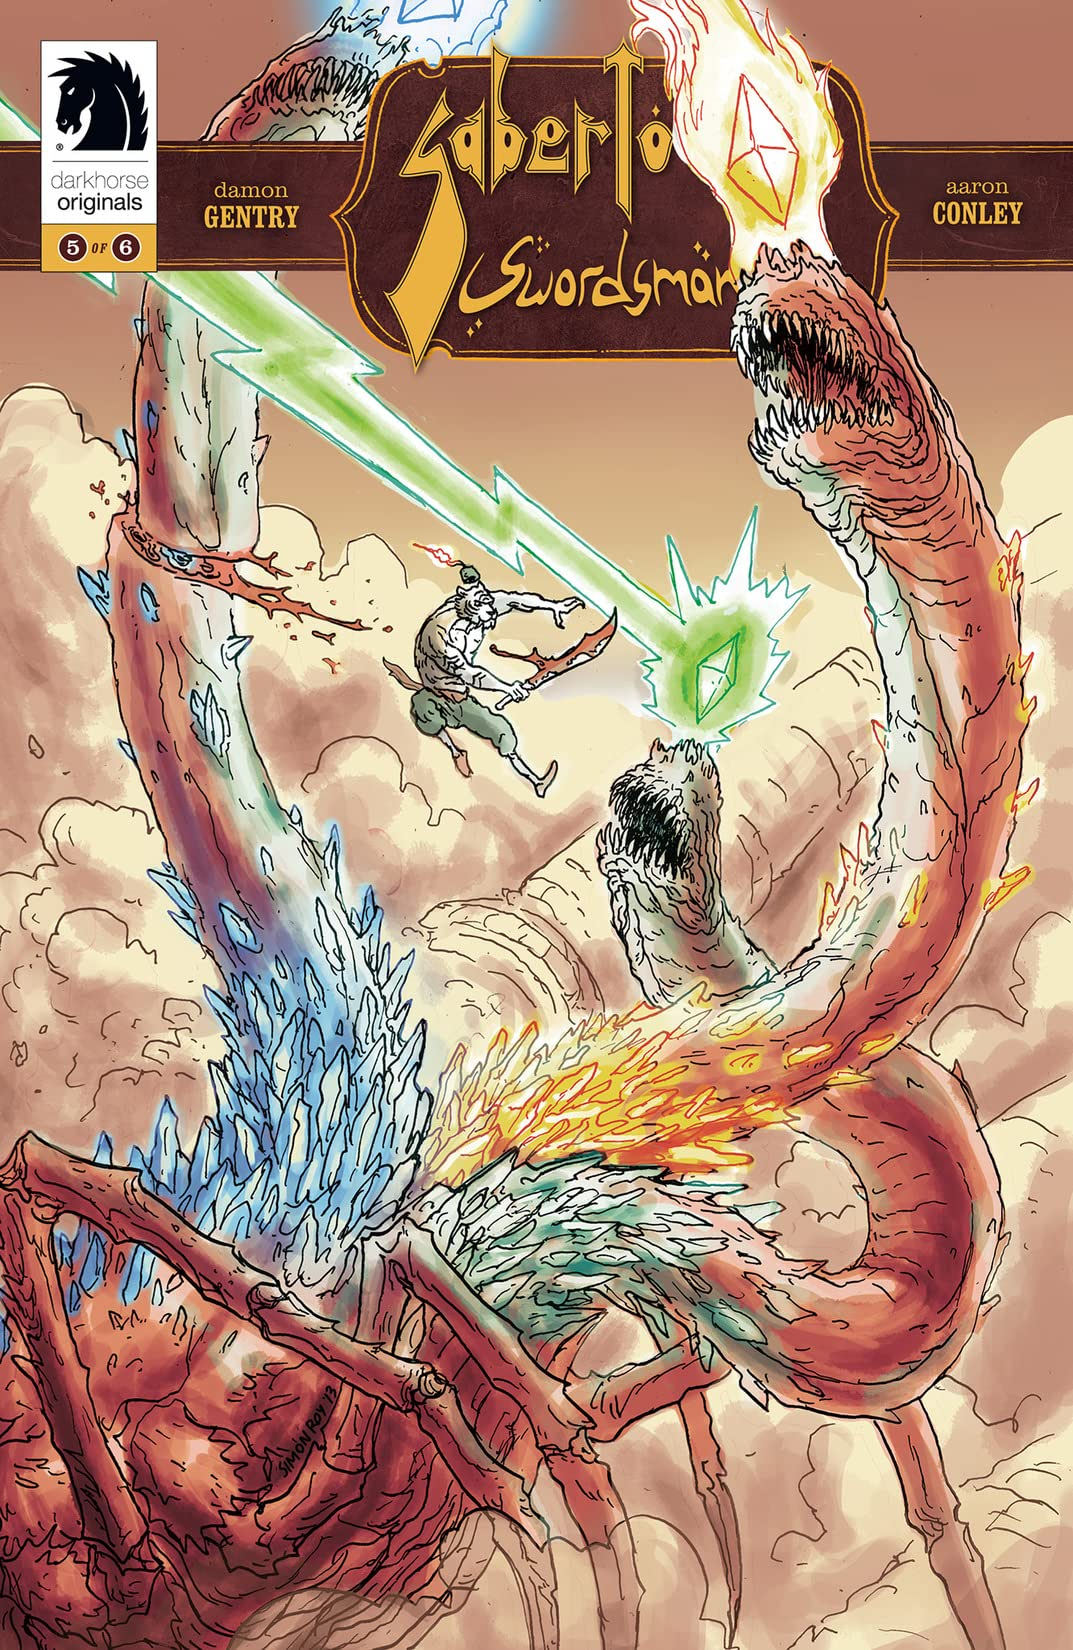 Sabertooth Swordsman #5